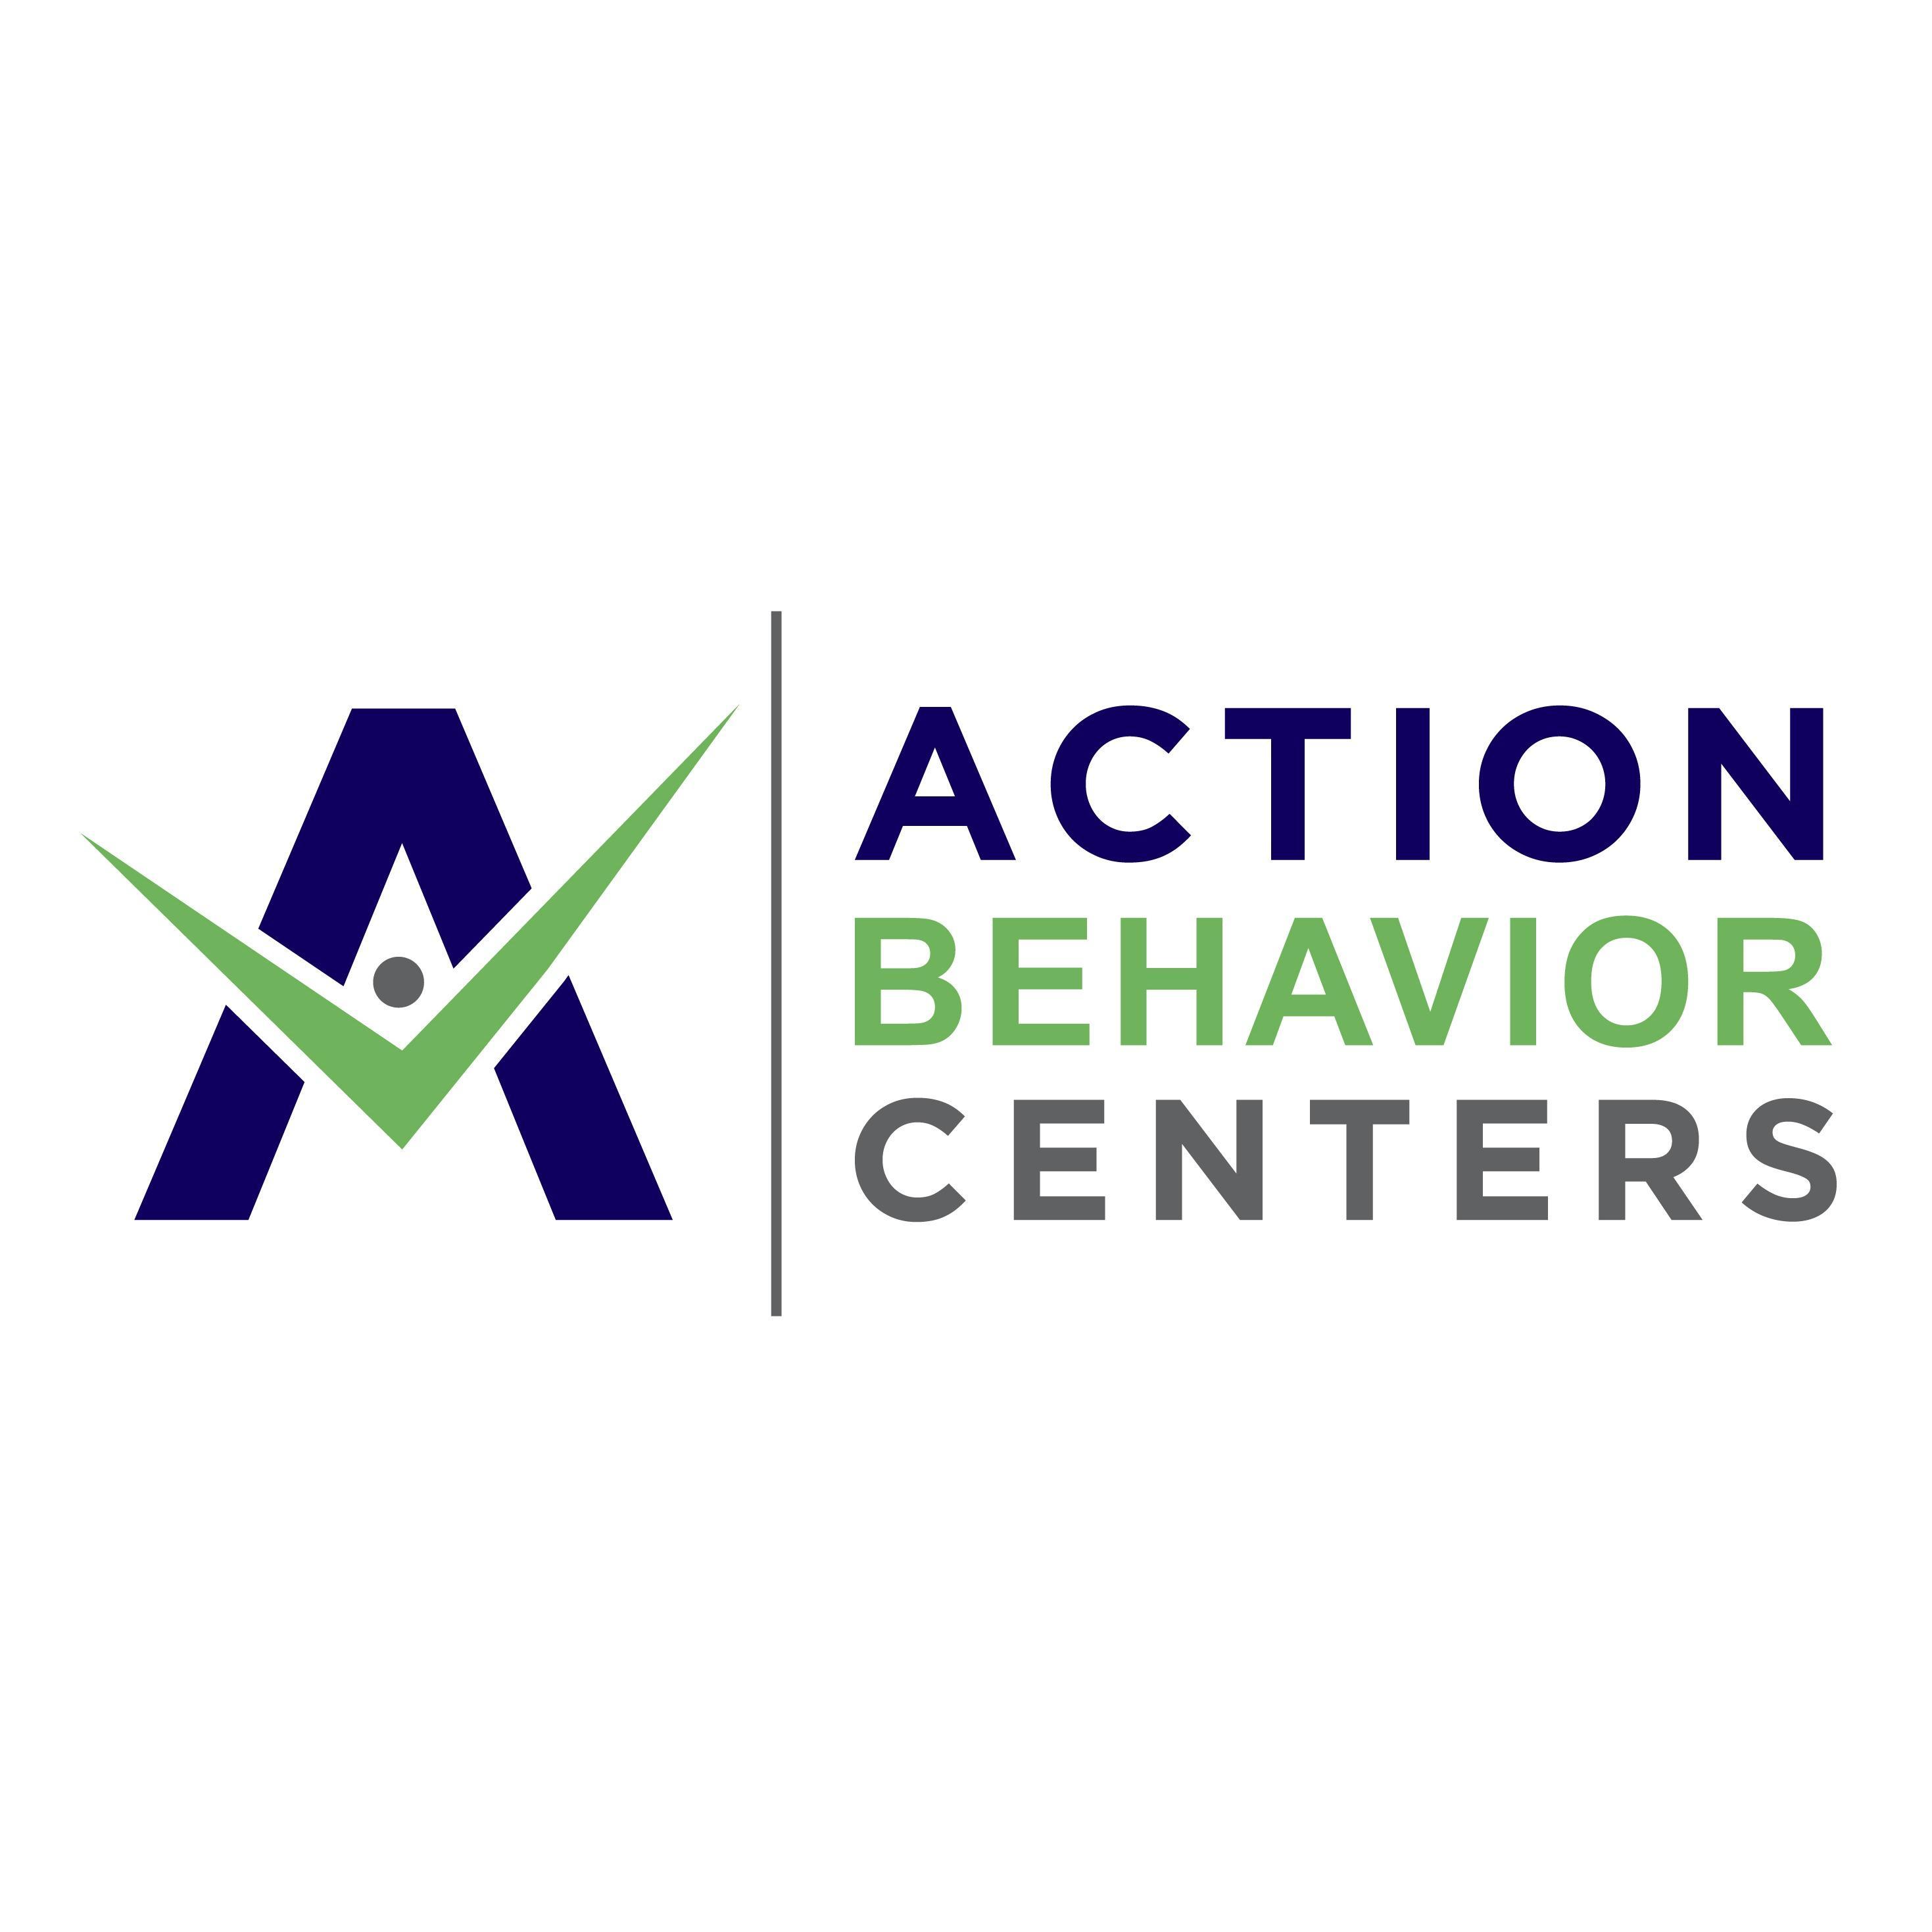 Action Behavior Centers